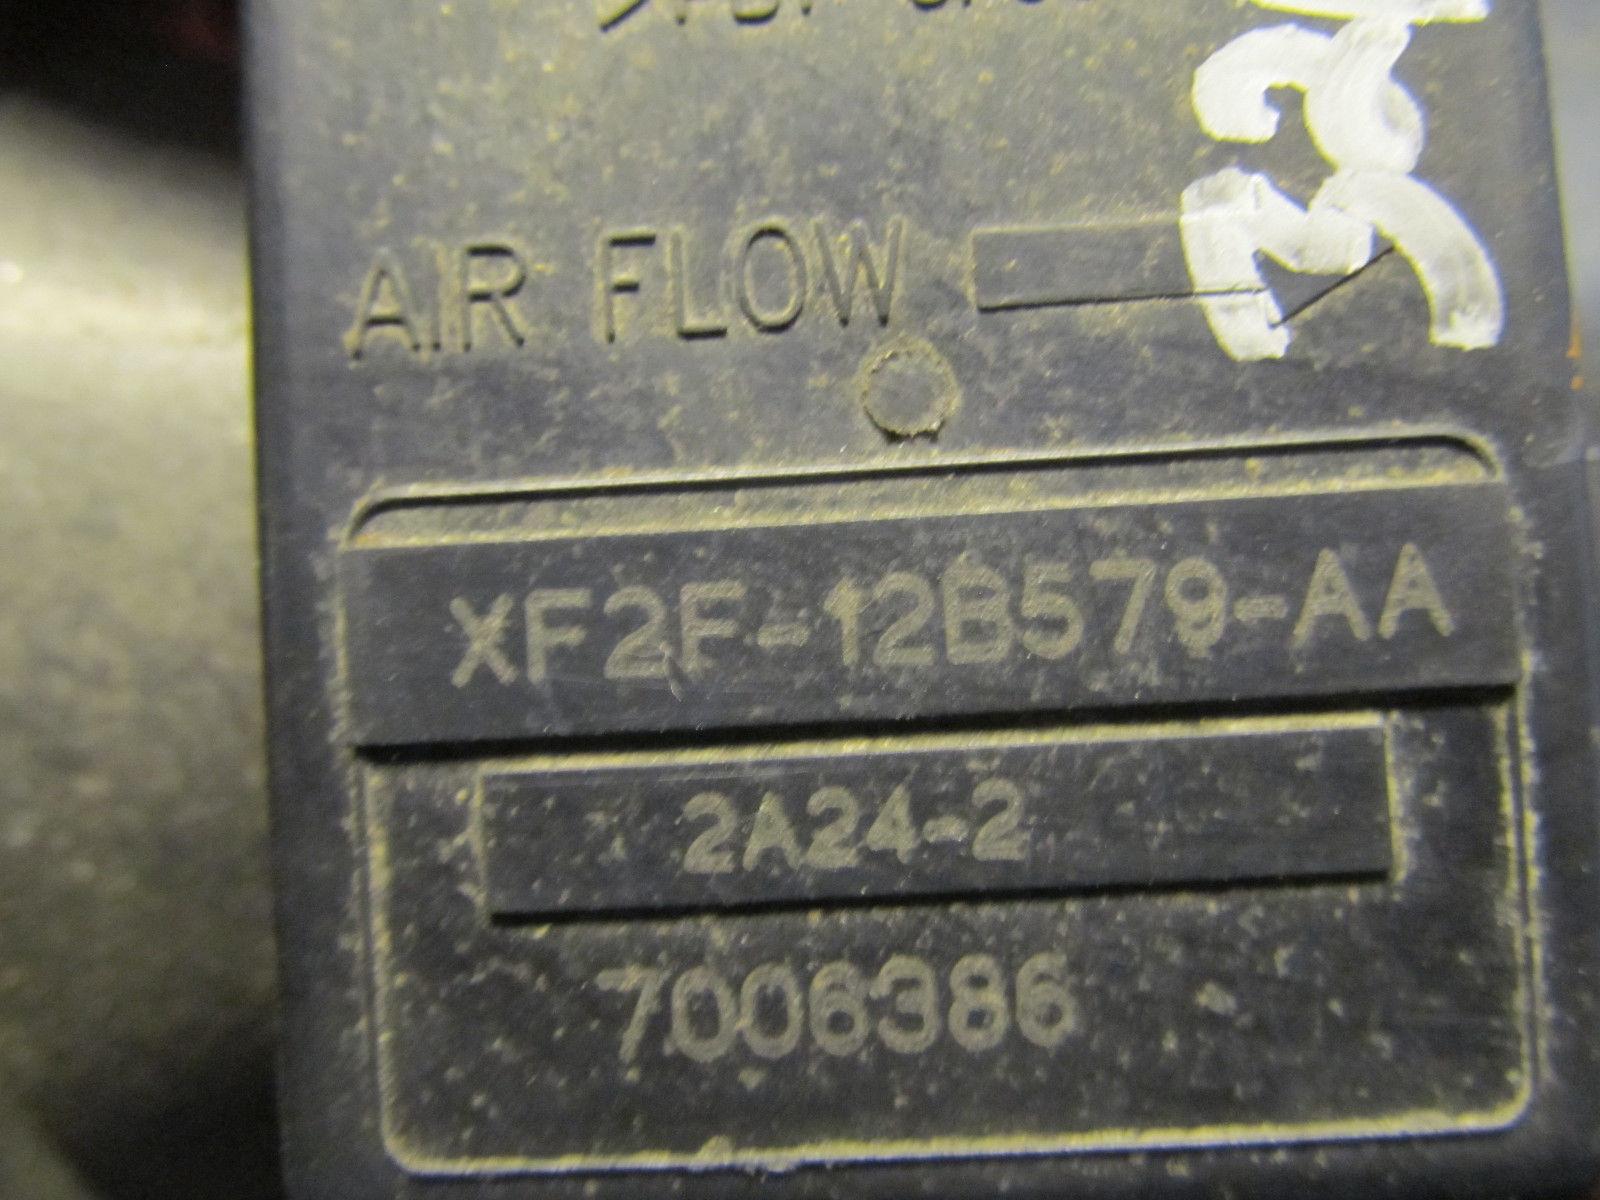 99-03 02 Ford Explorer mountaineer 4.0 oem mass air flow sensor xf2f-12b579-aa